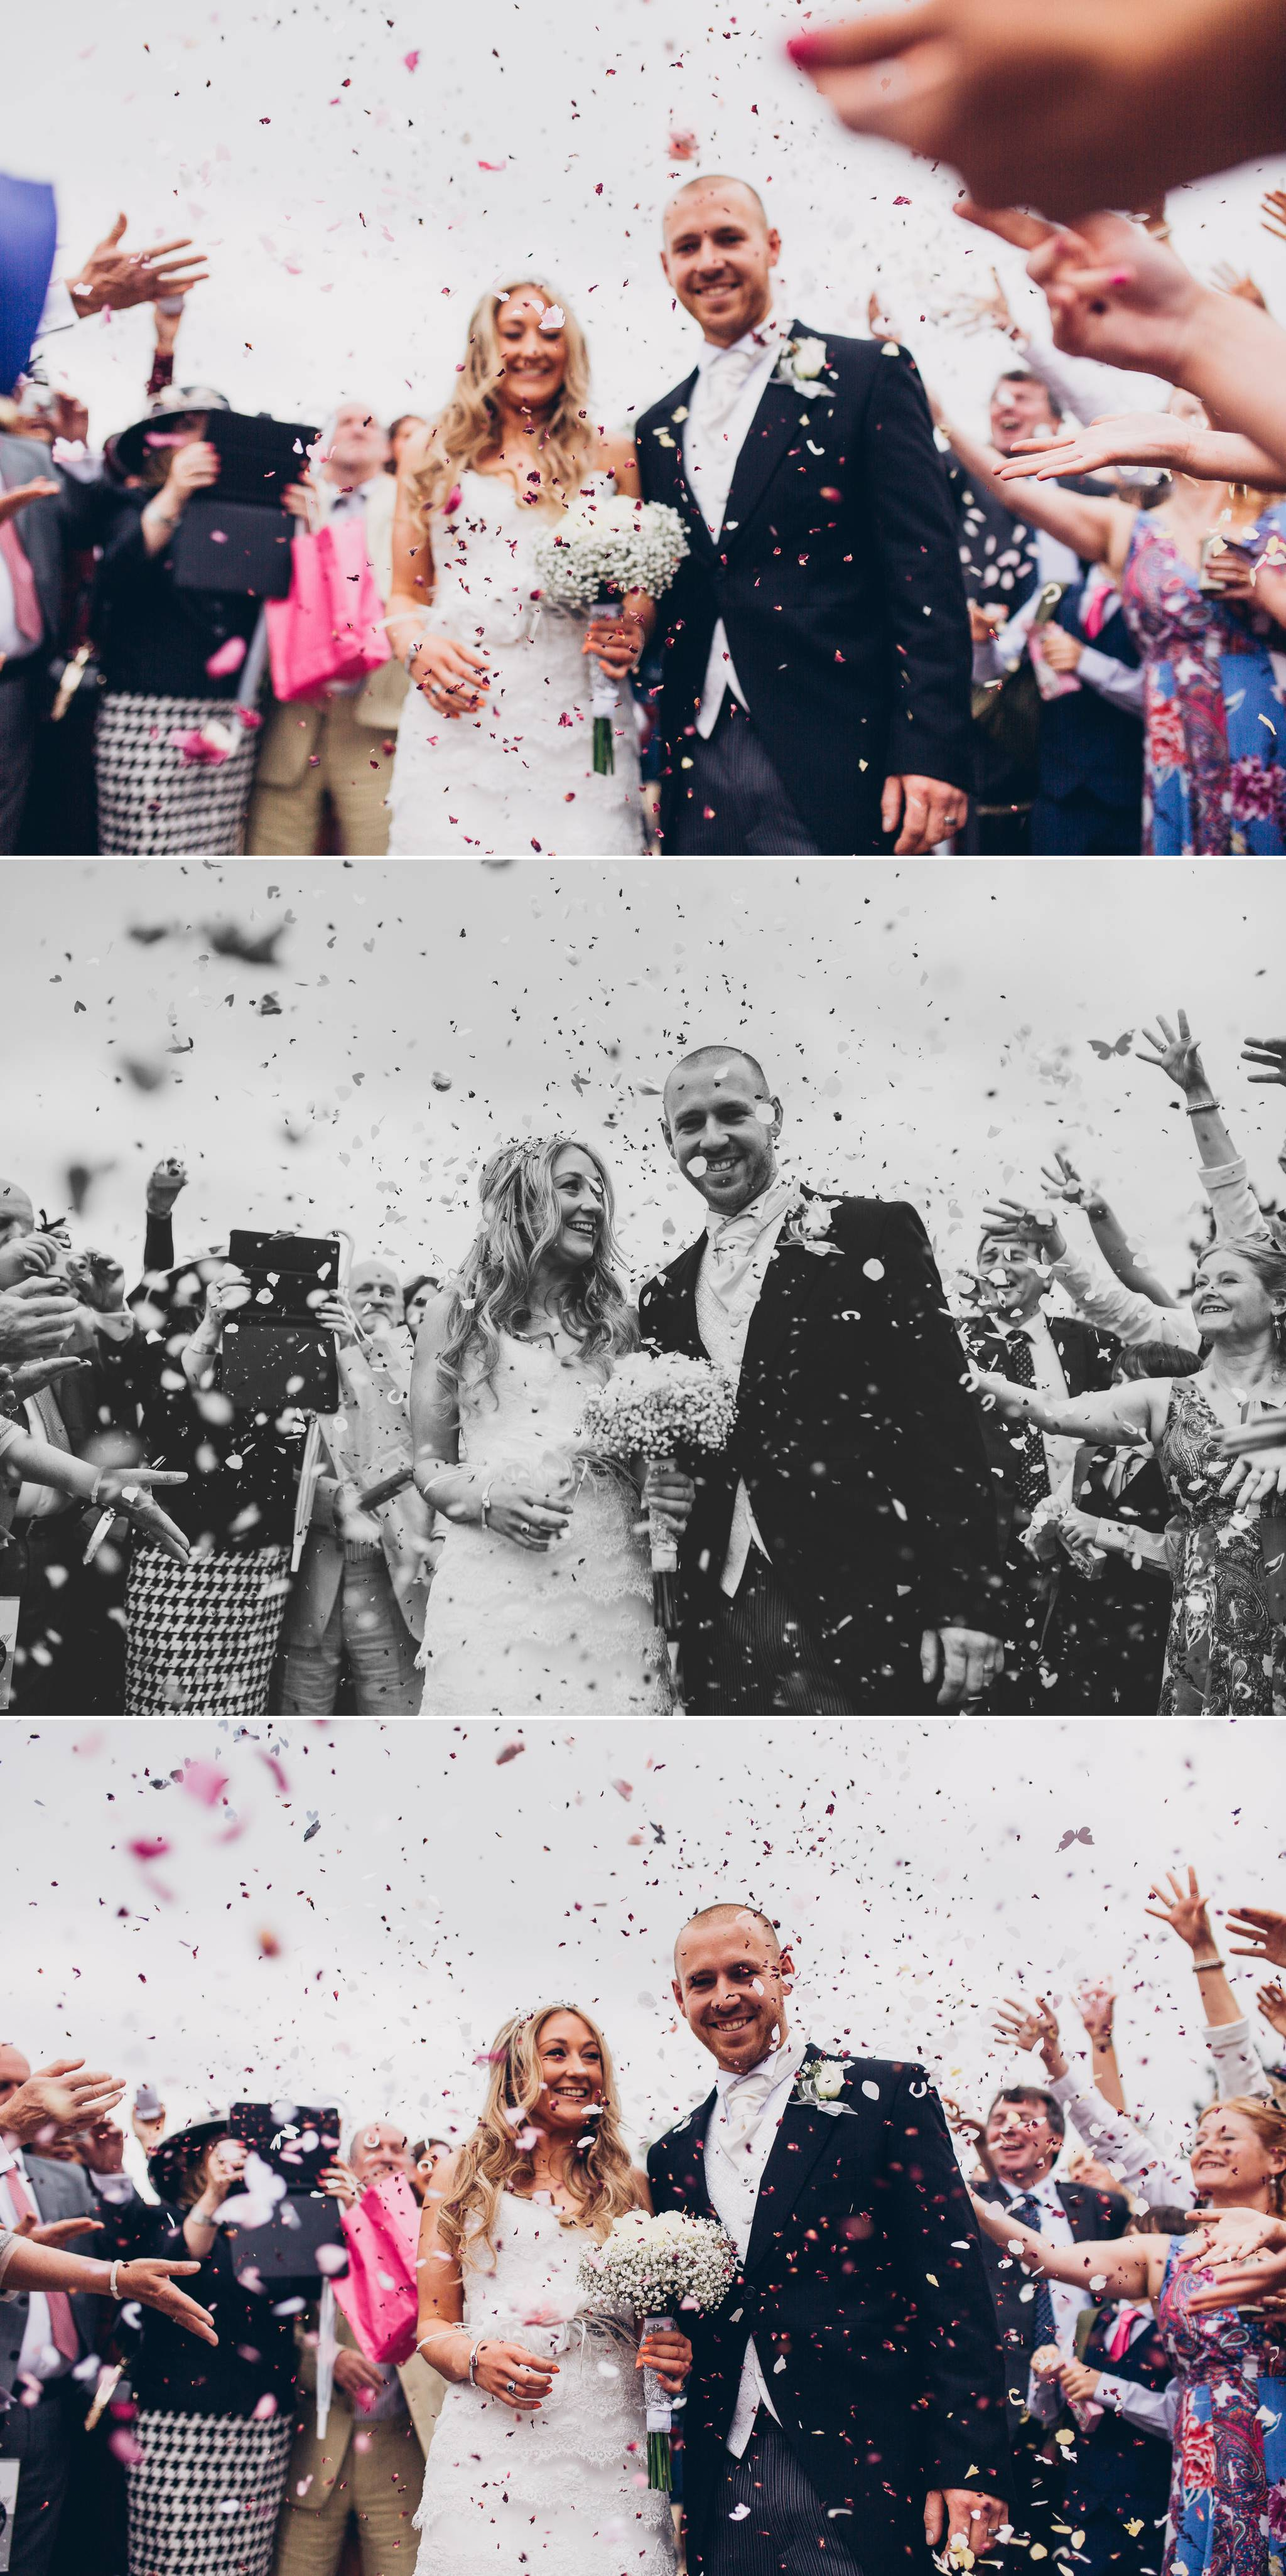 shropshire-wedding-photography 13.jpg